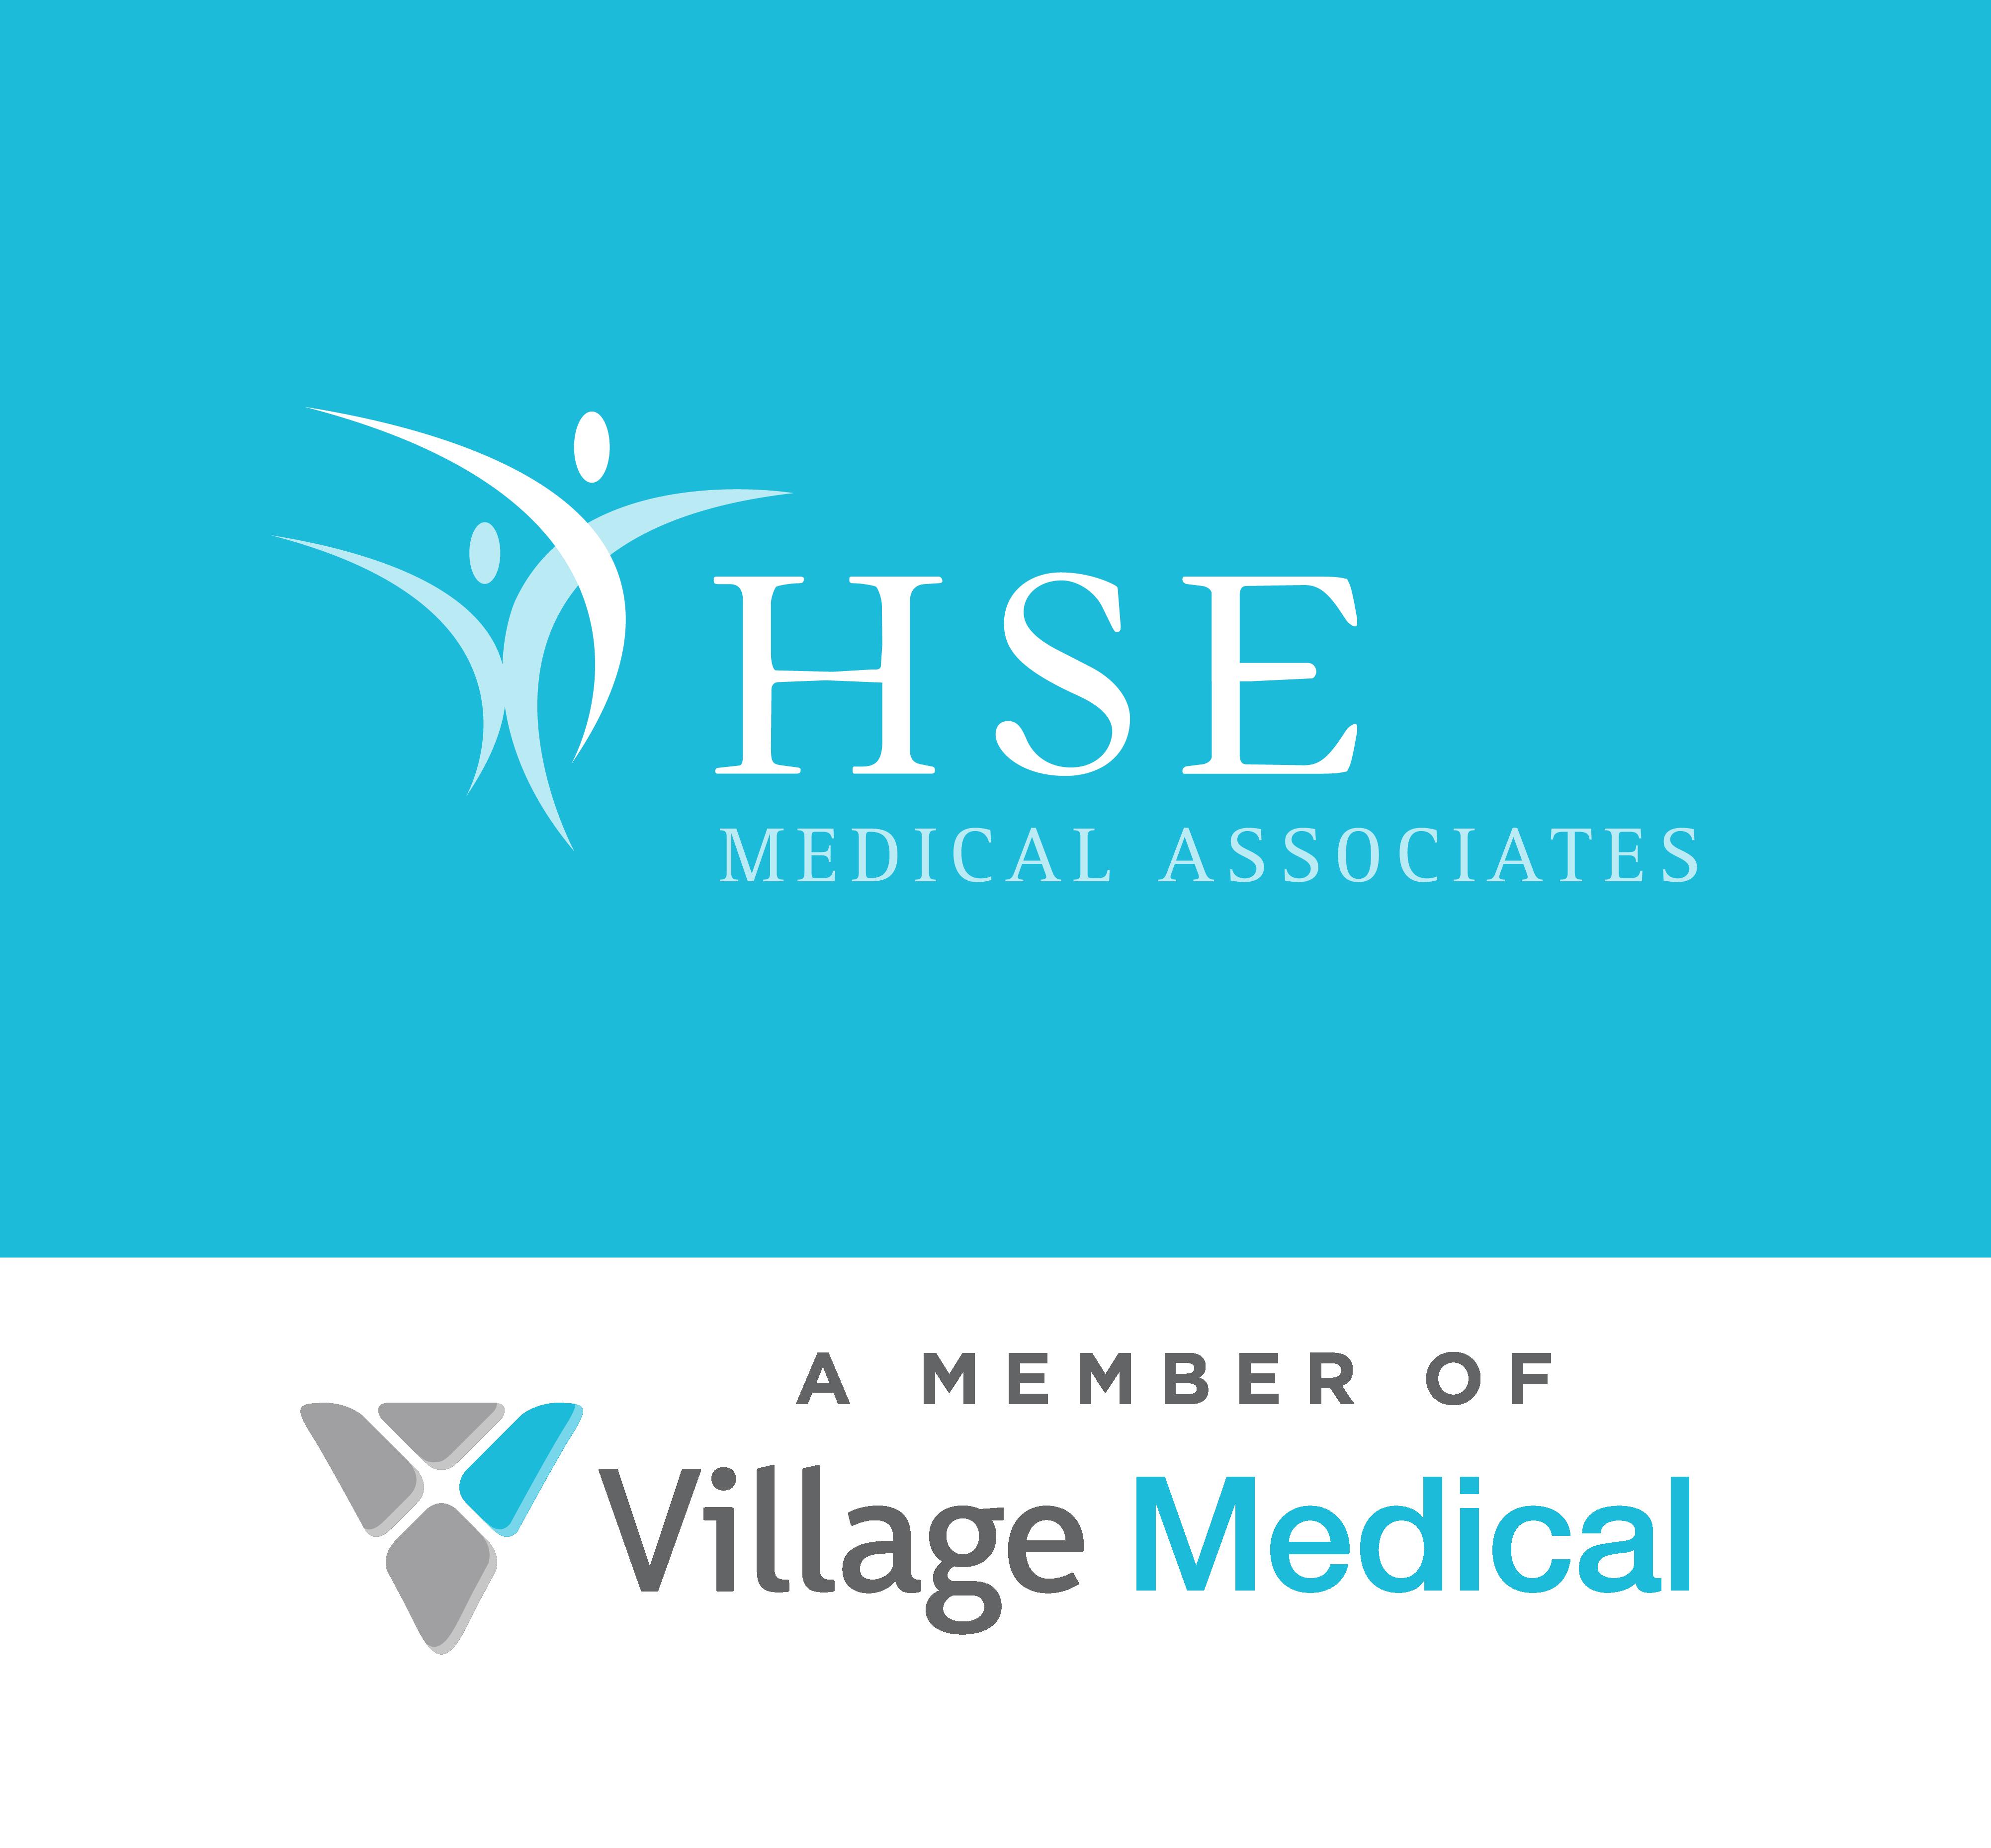 Village Medical  - 10720 Barker Cypress Rd   Cypress, TX 77433